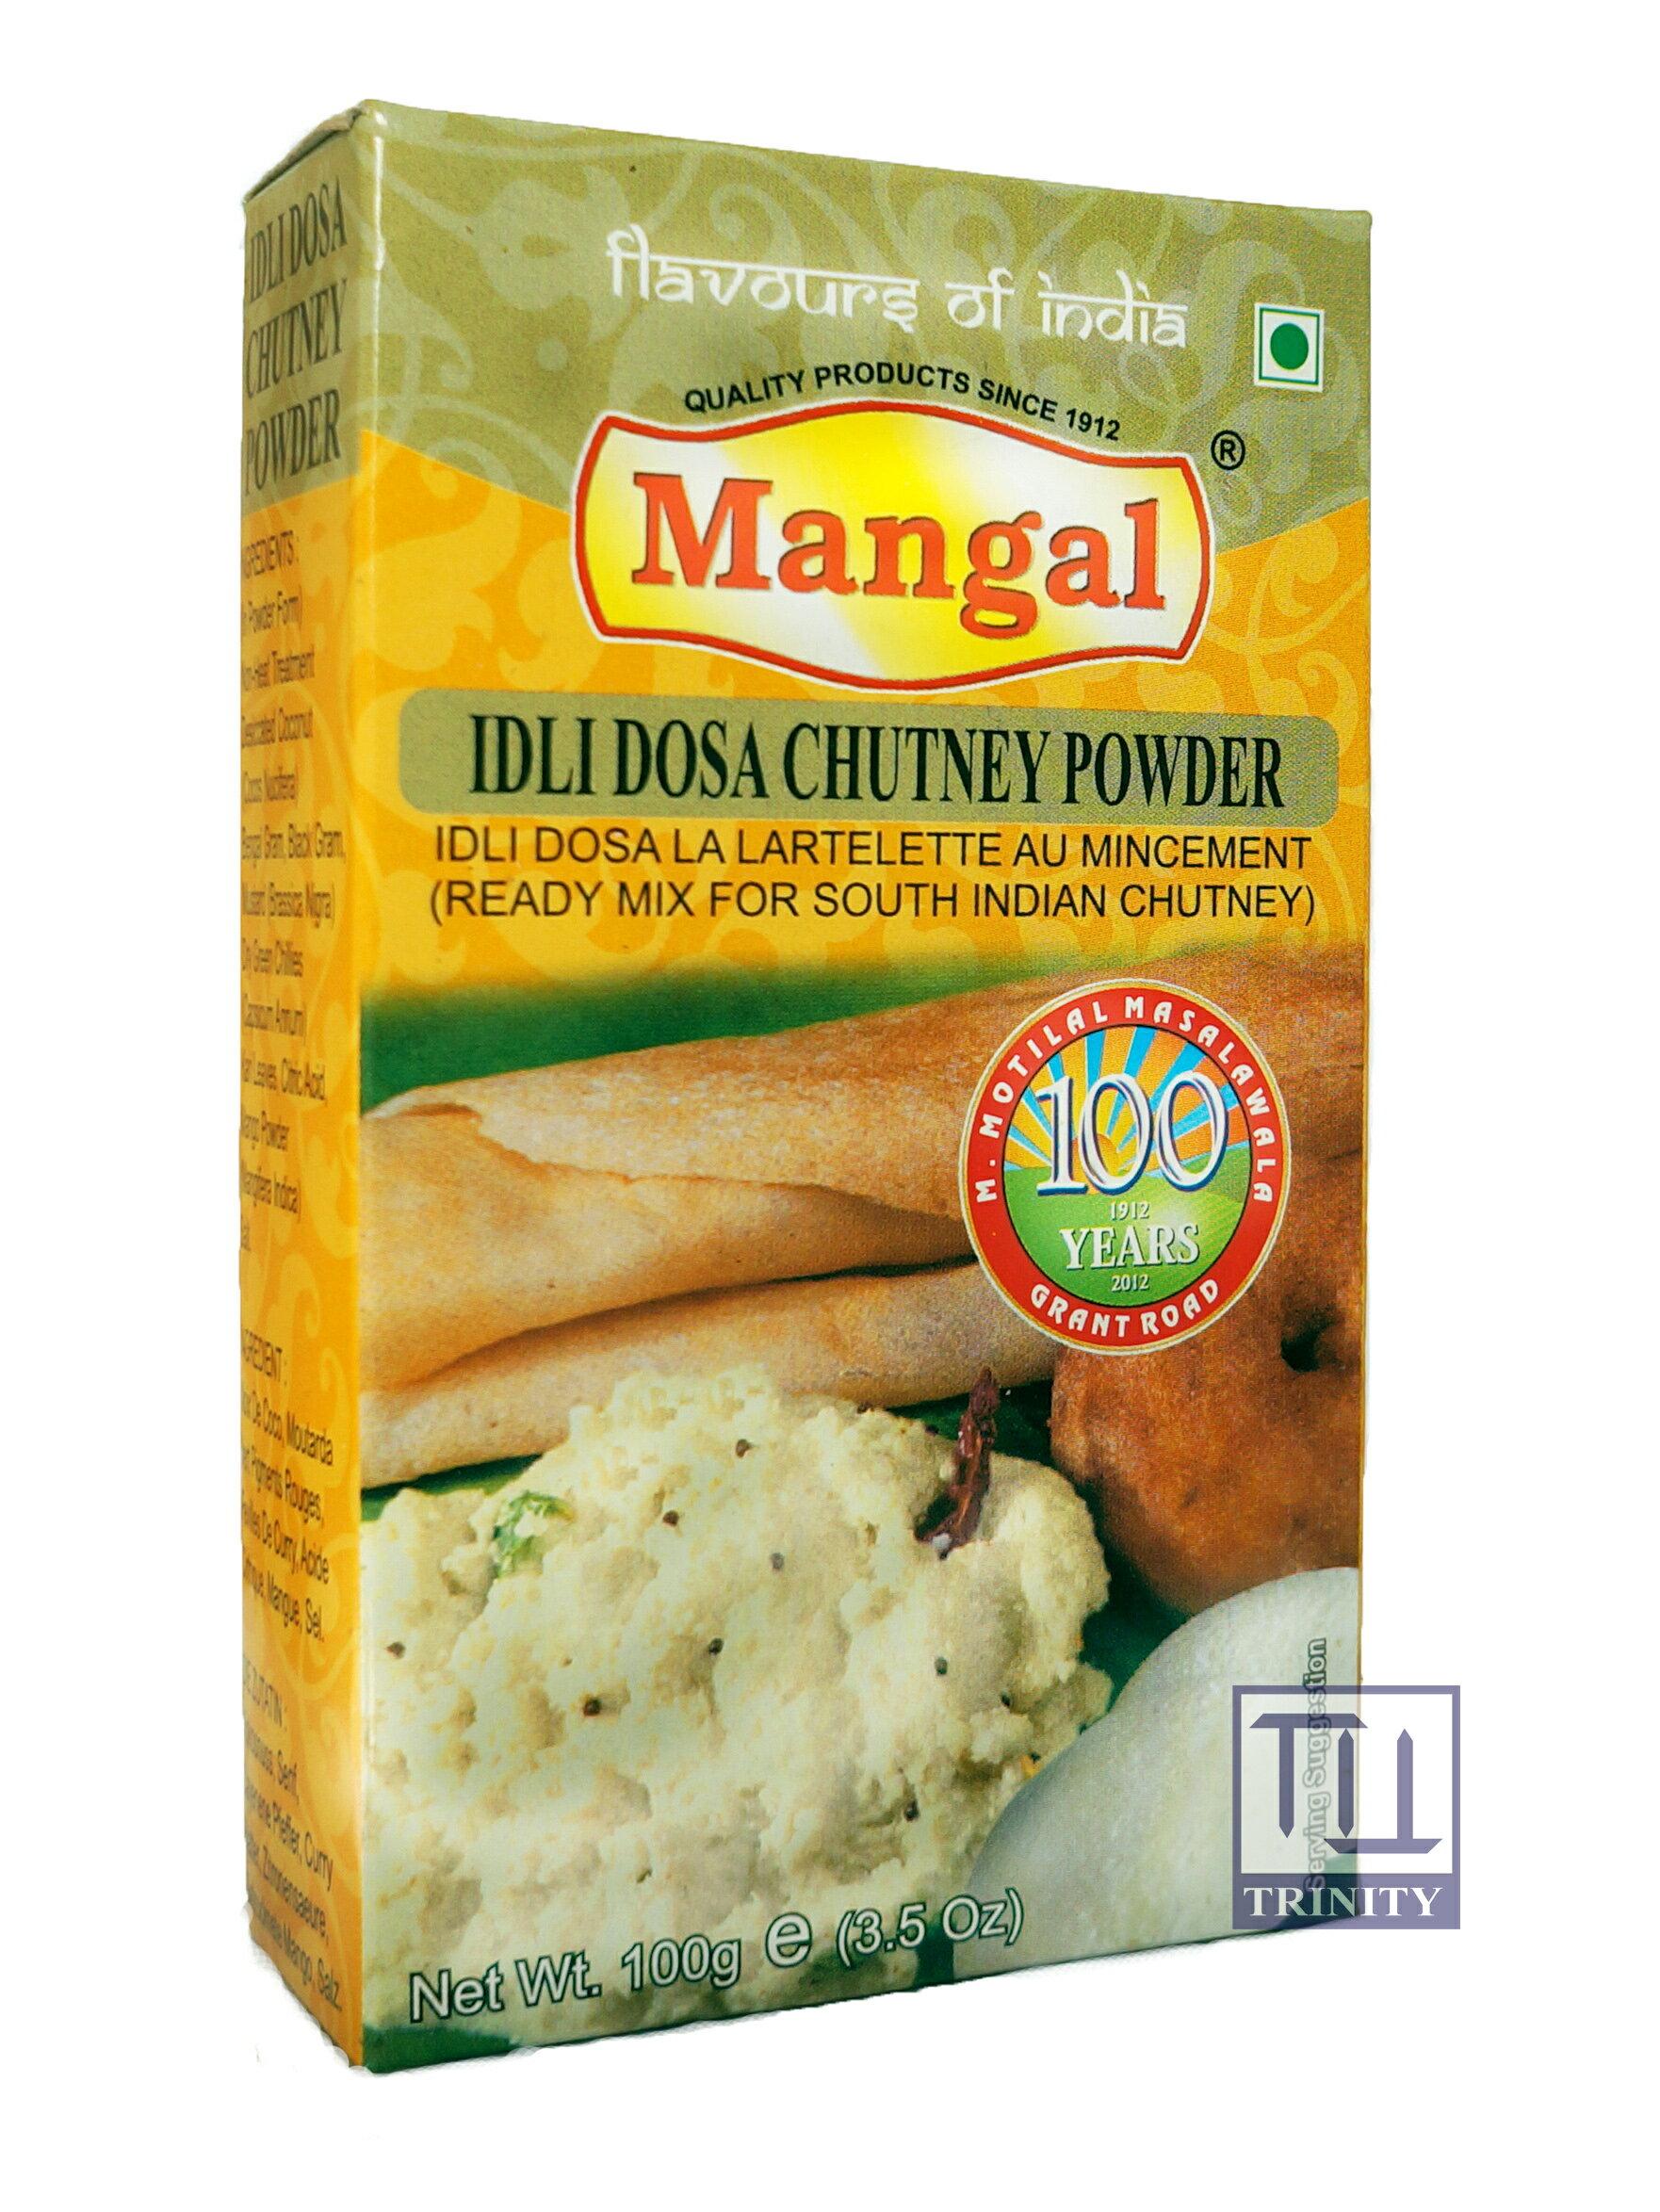 Mangal Idli Dosa Chutney Powder 印度香料粉( 做Idli /Dosa沾醬用)